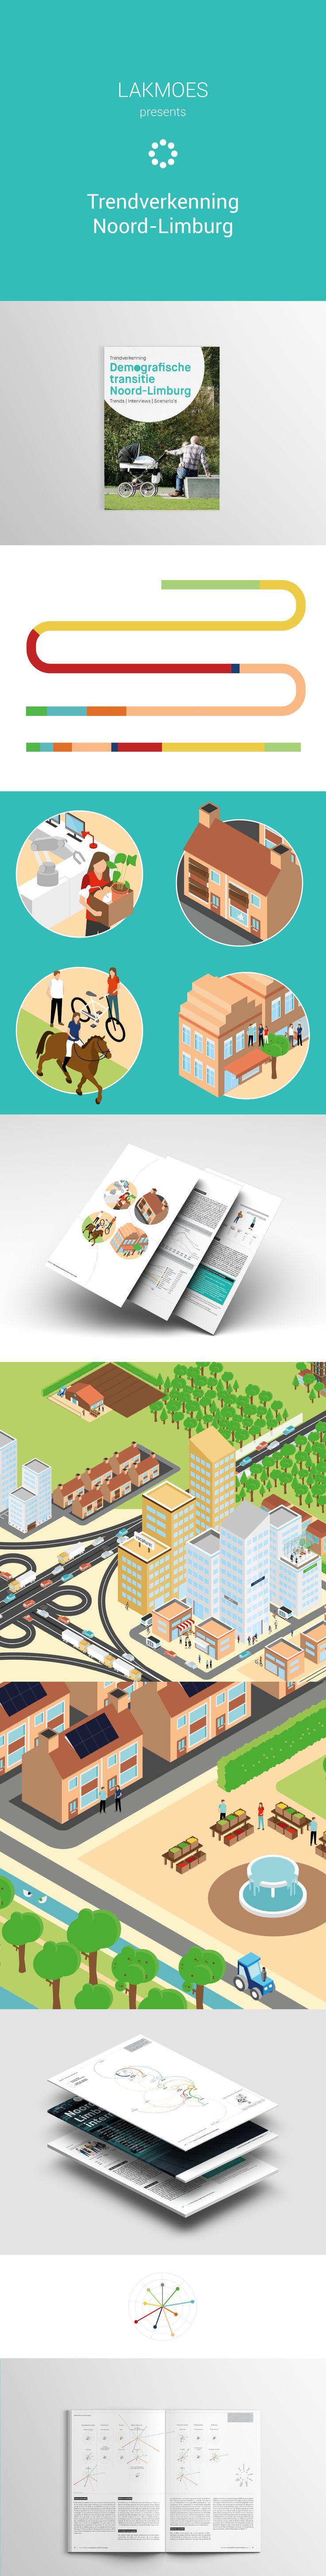 Verkenning van de demografische transities in Noord-Limburg #studiolakmoes #infographic #design #datavisualisation #graphicdesign #data #infodesign